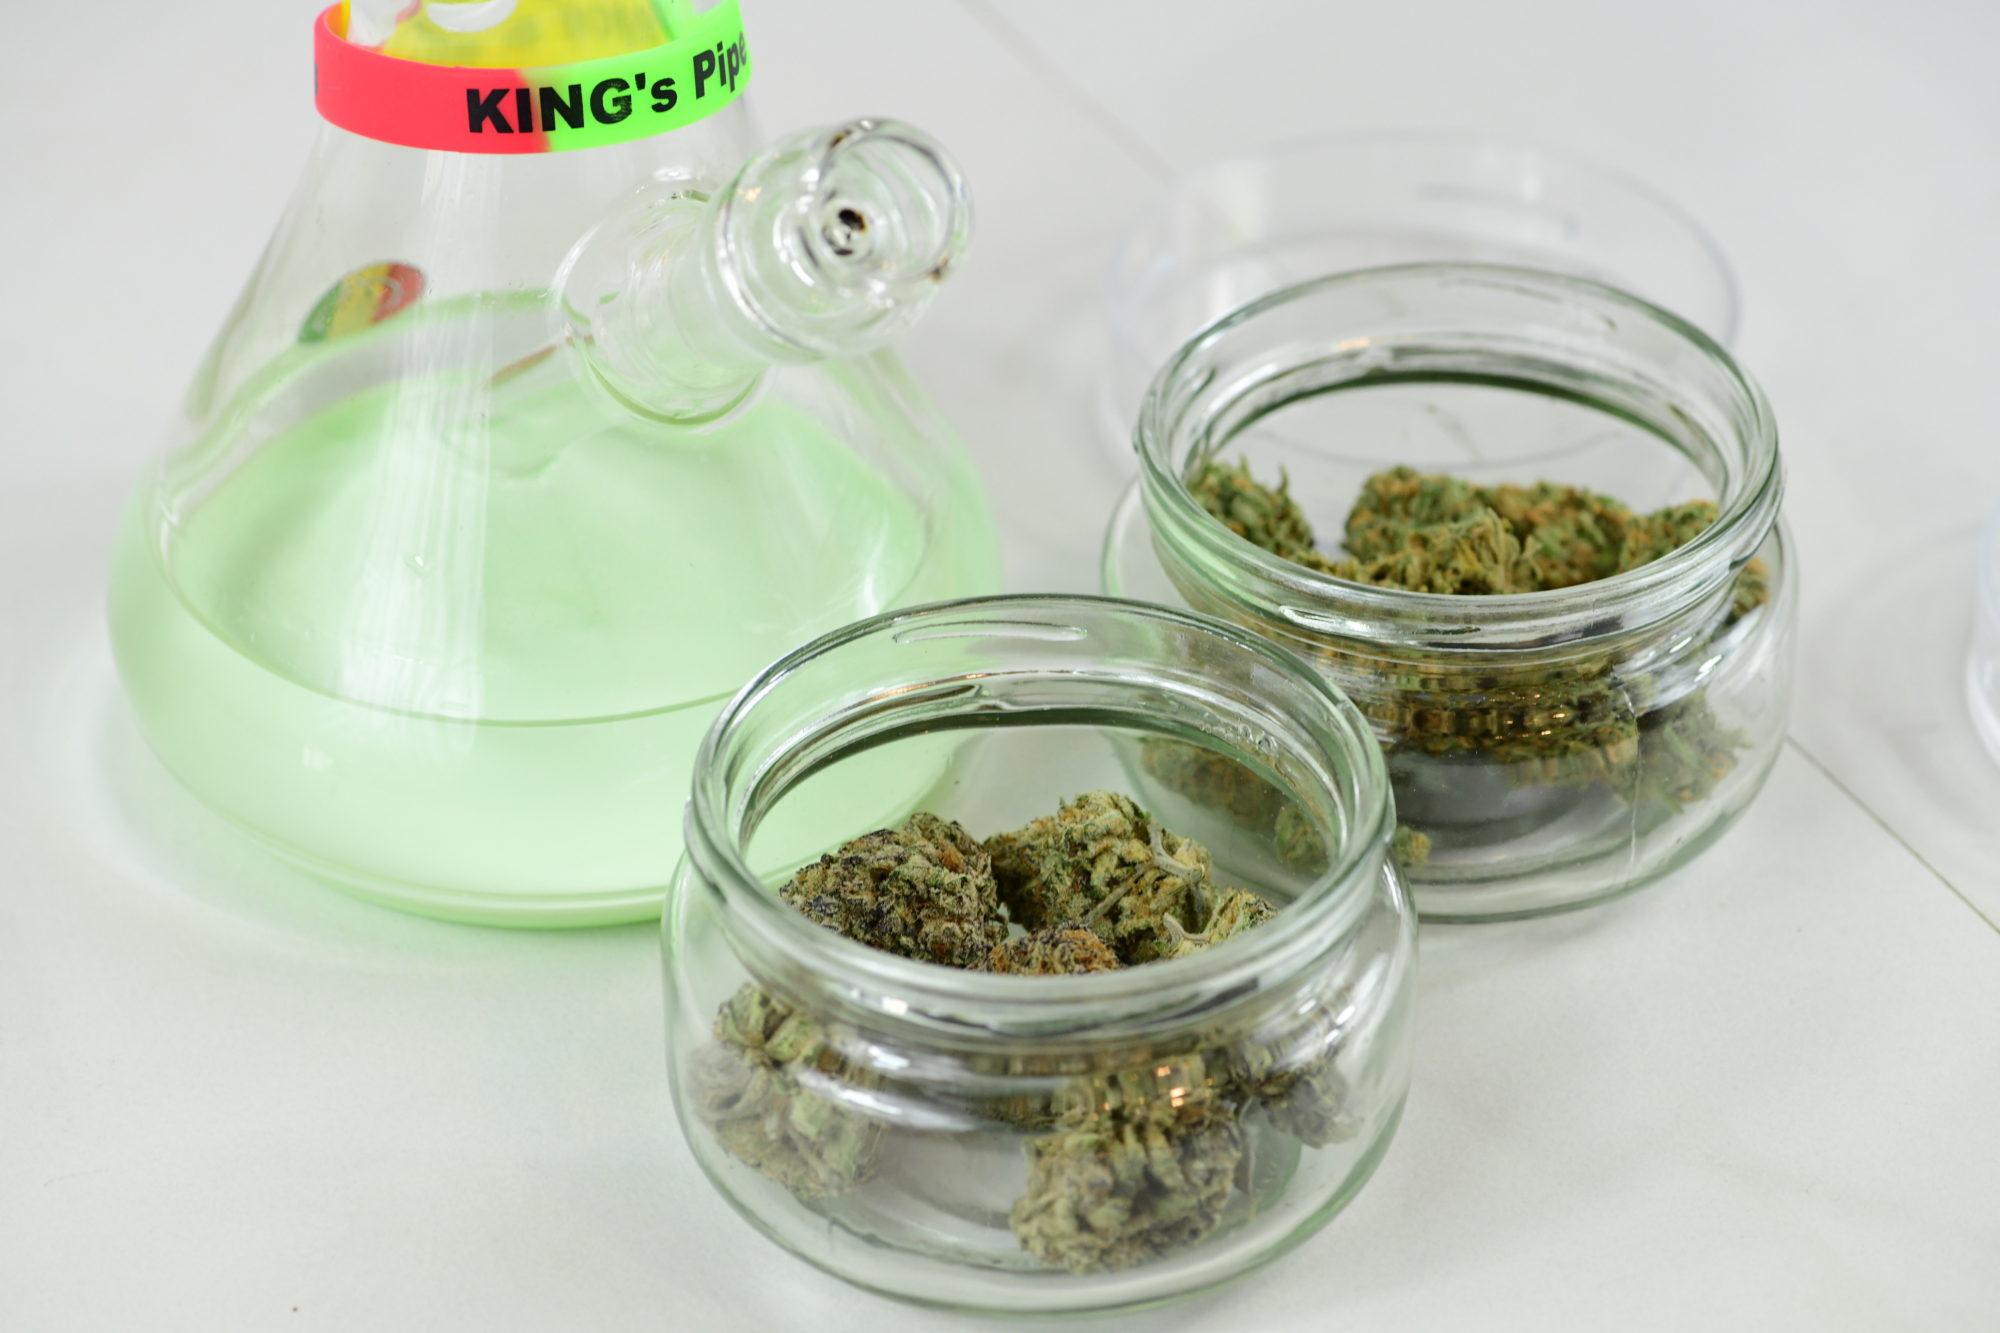 bong and weed